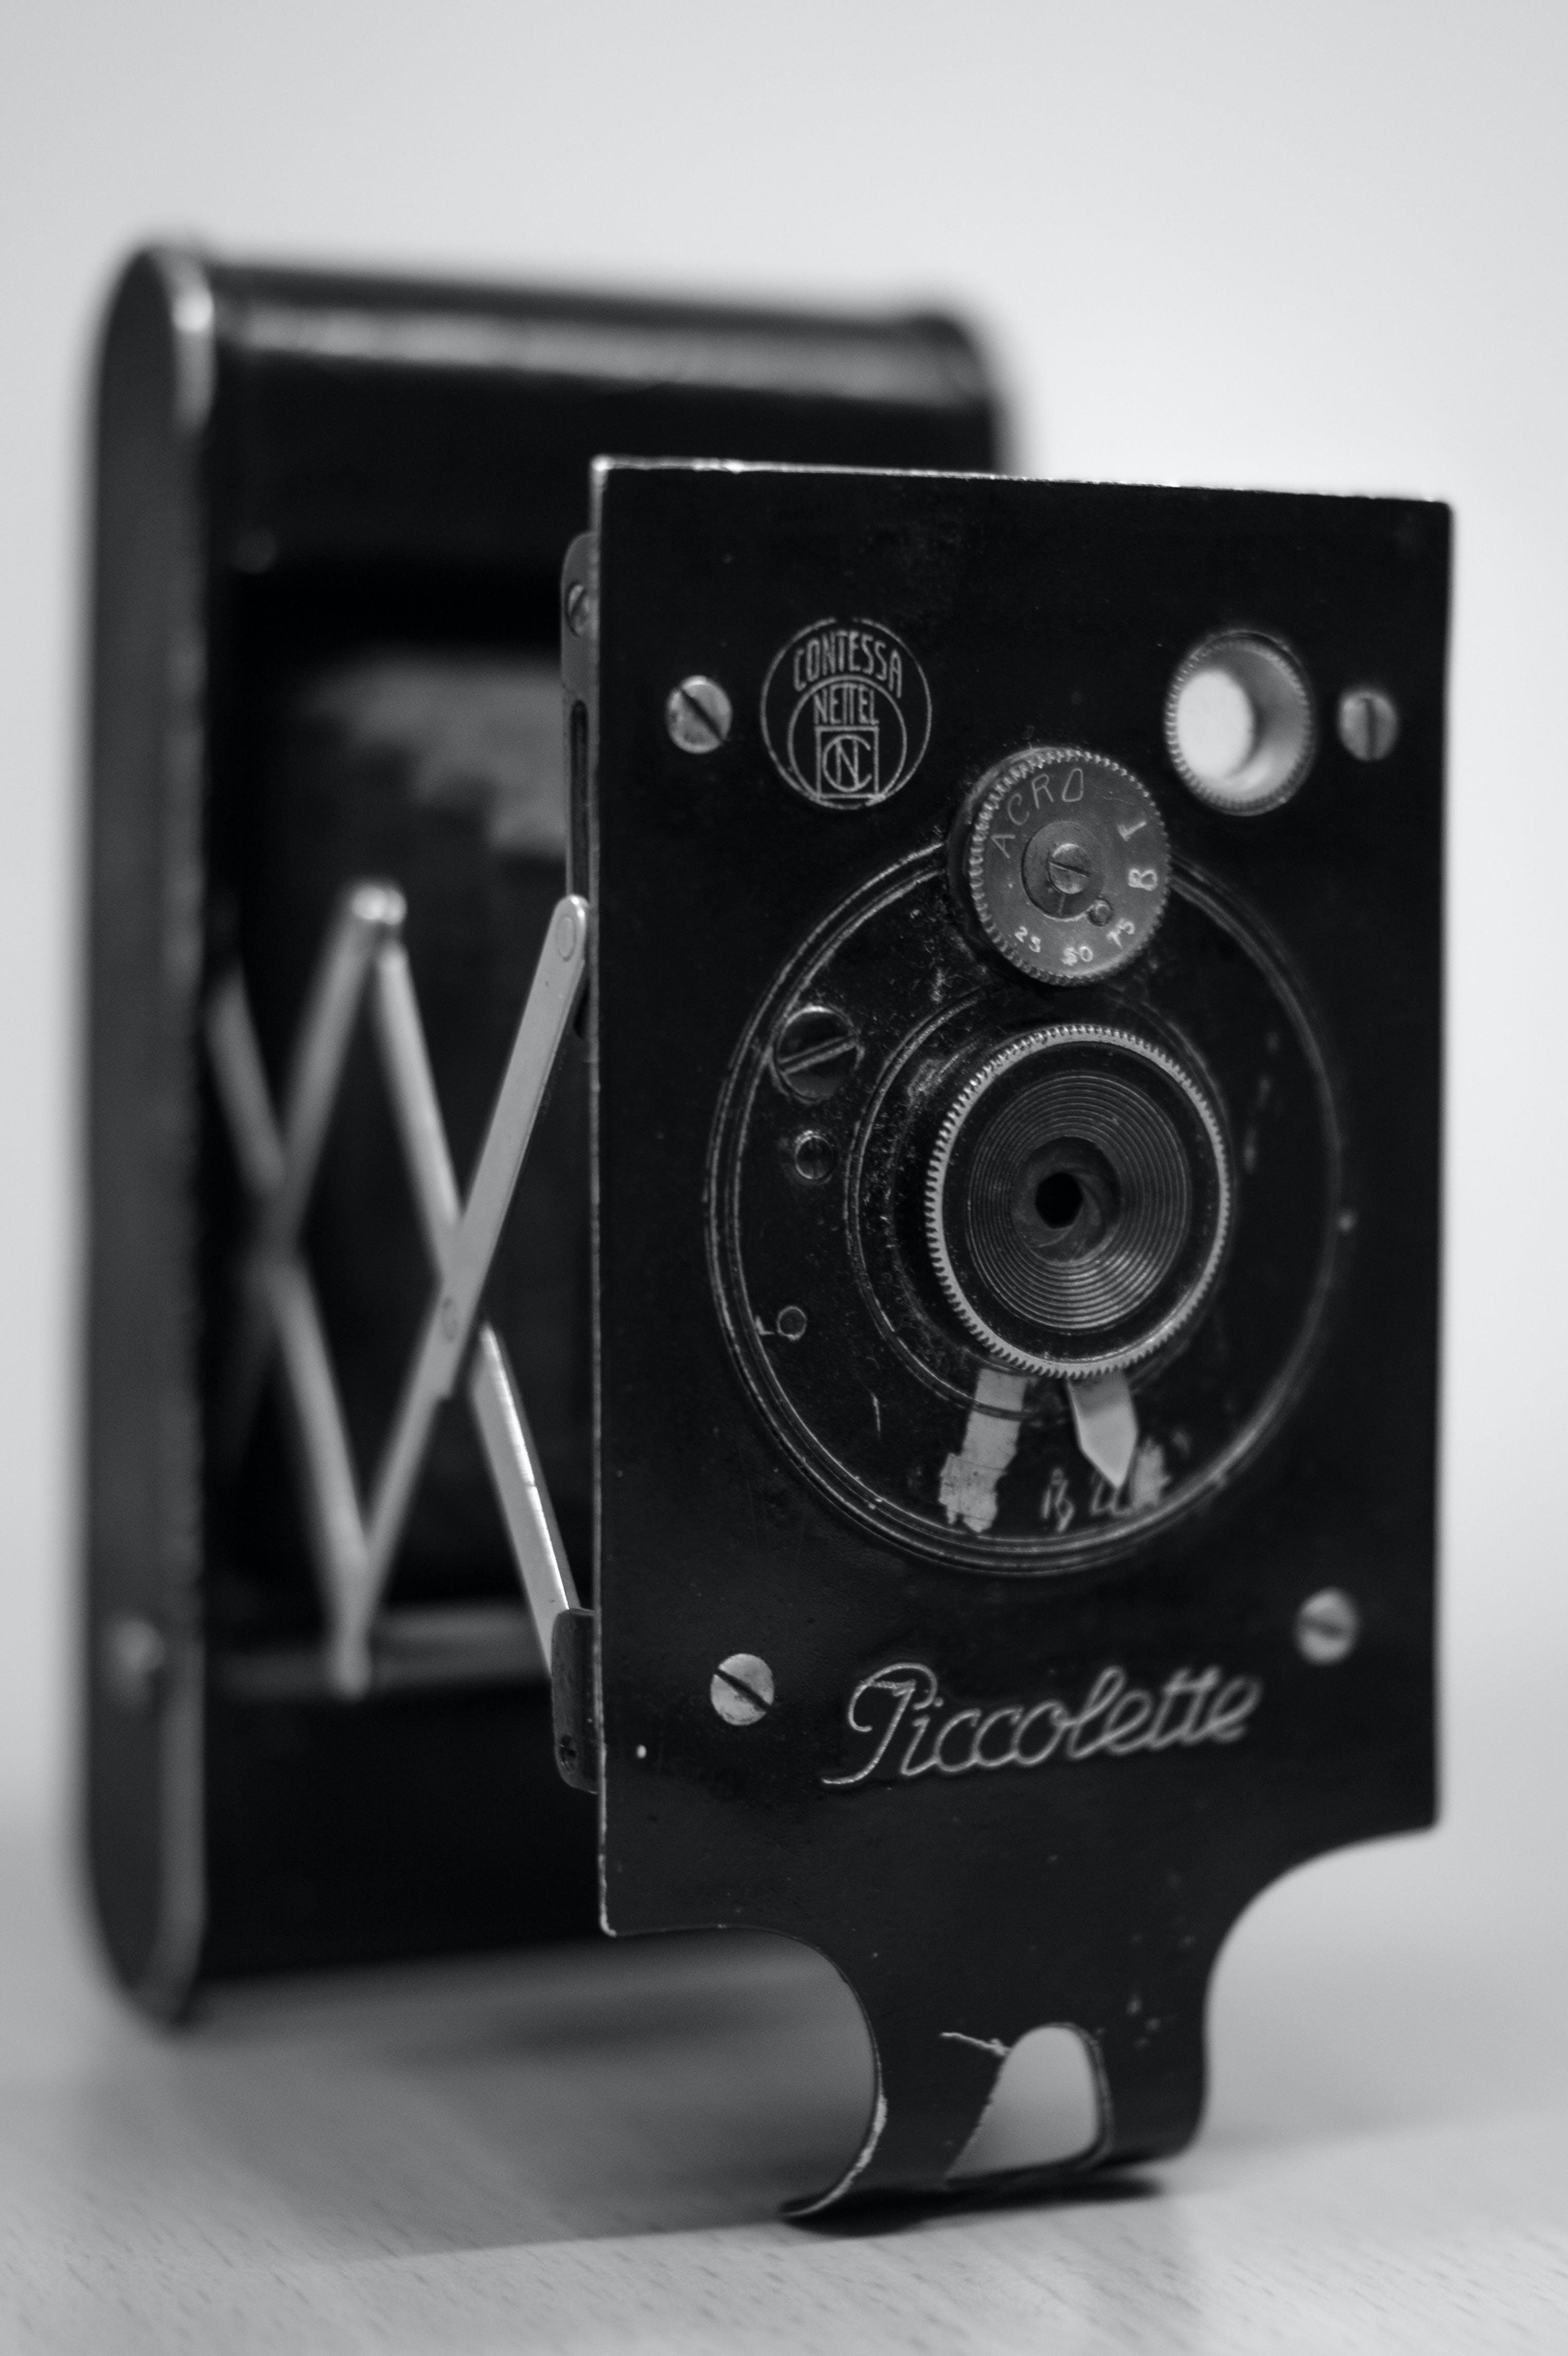 Vintage Camera 183 Free Stock Photo